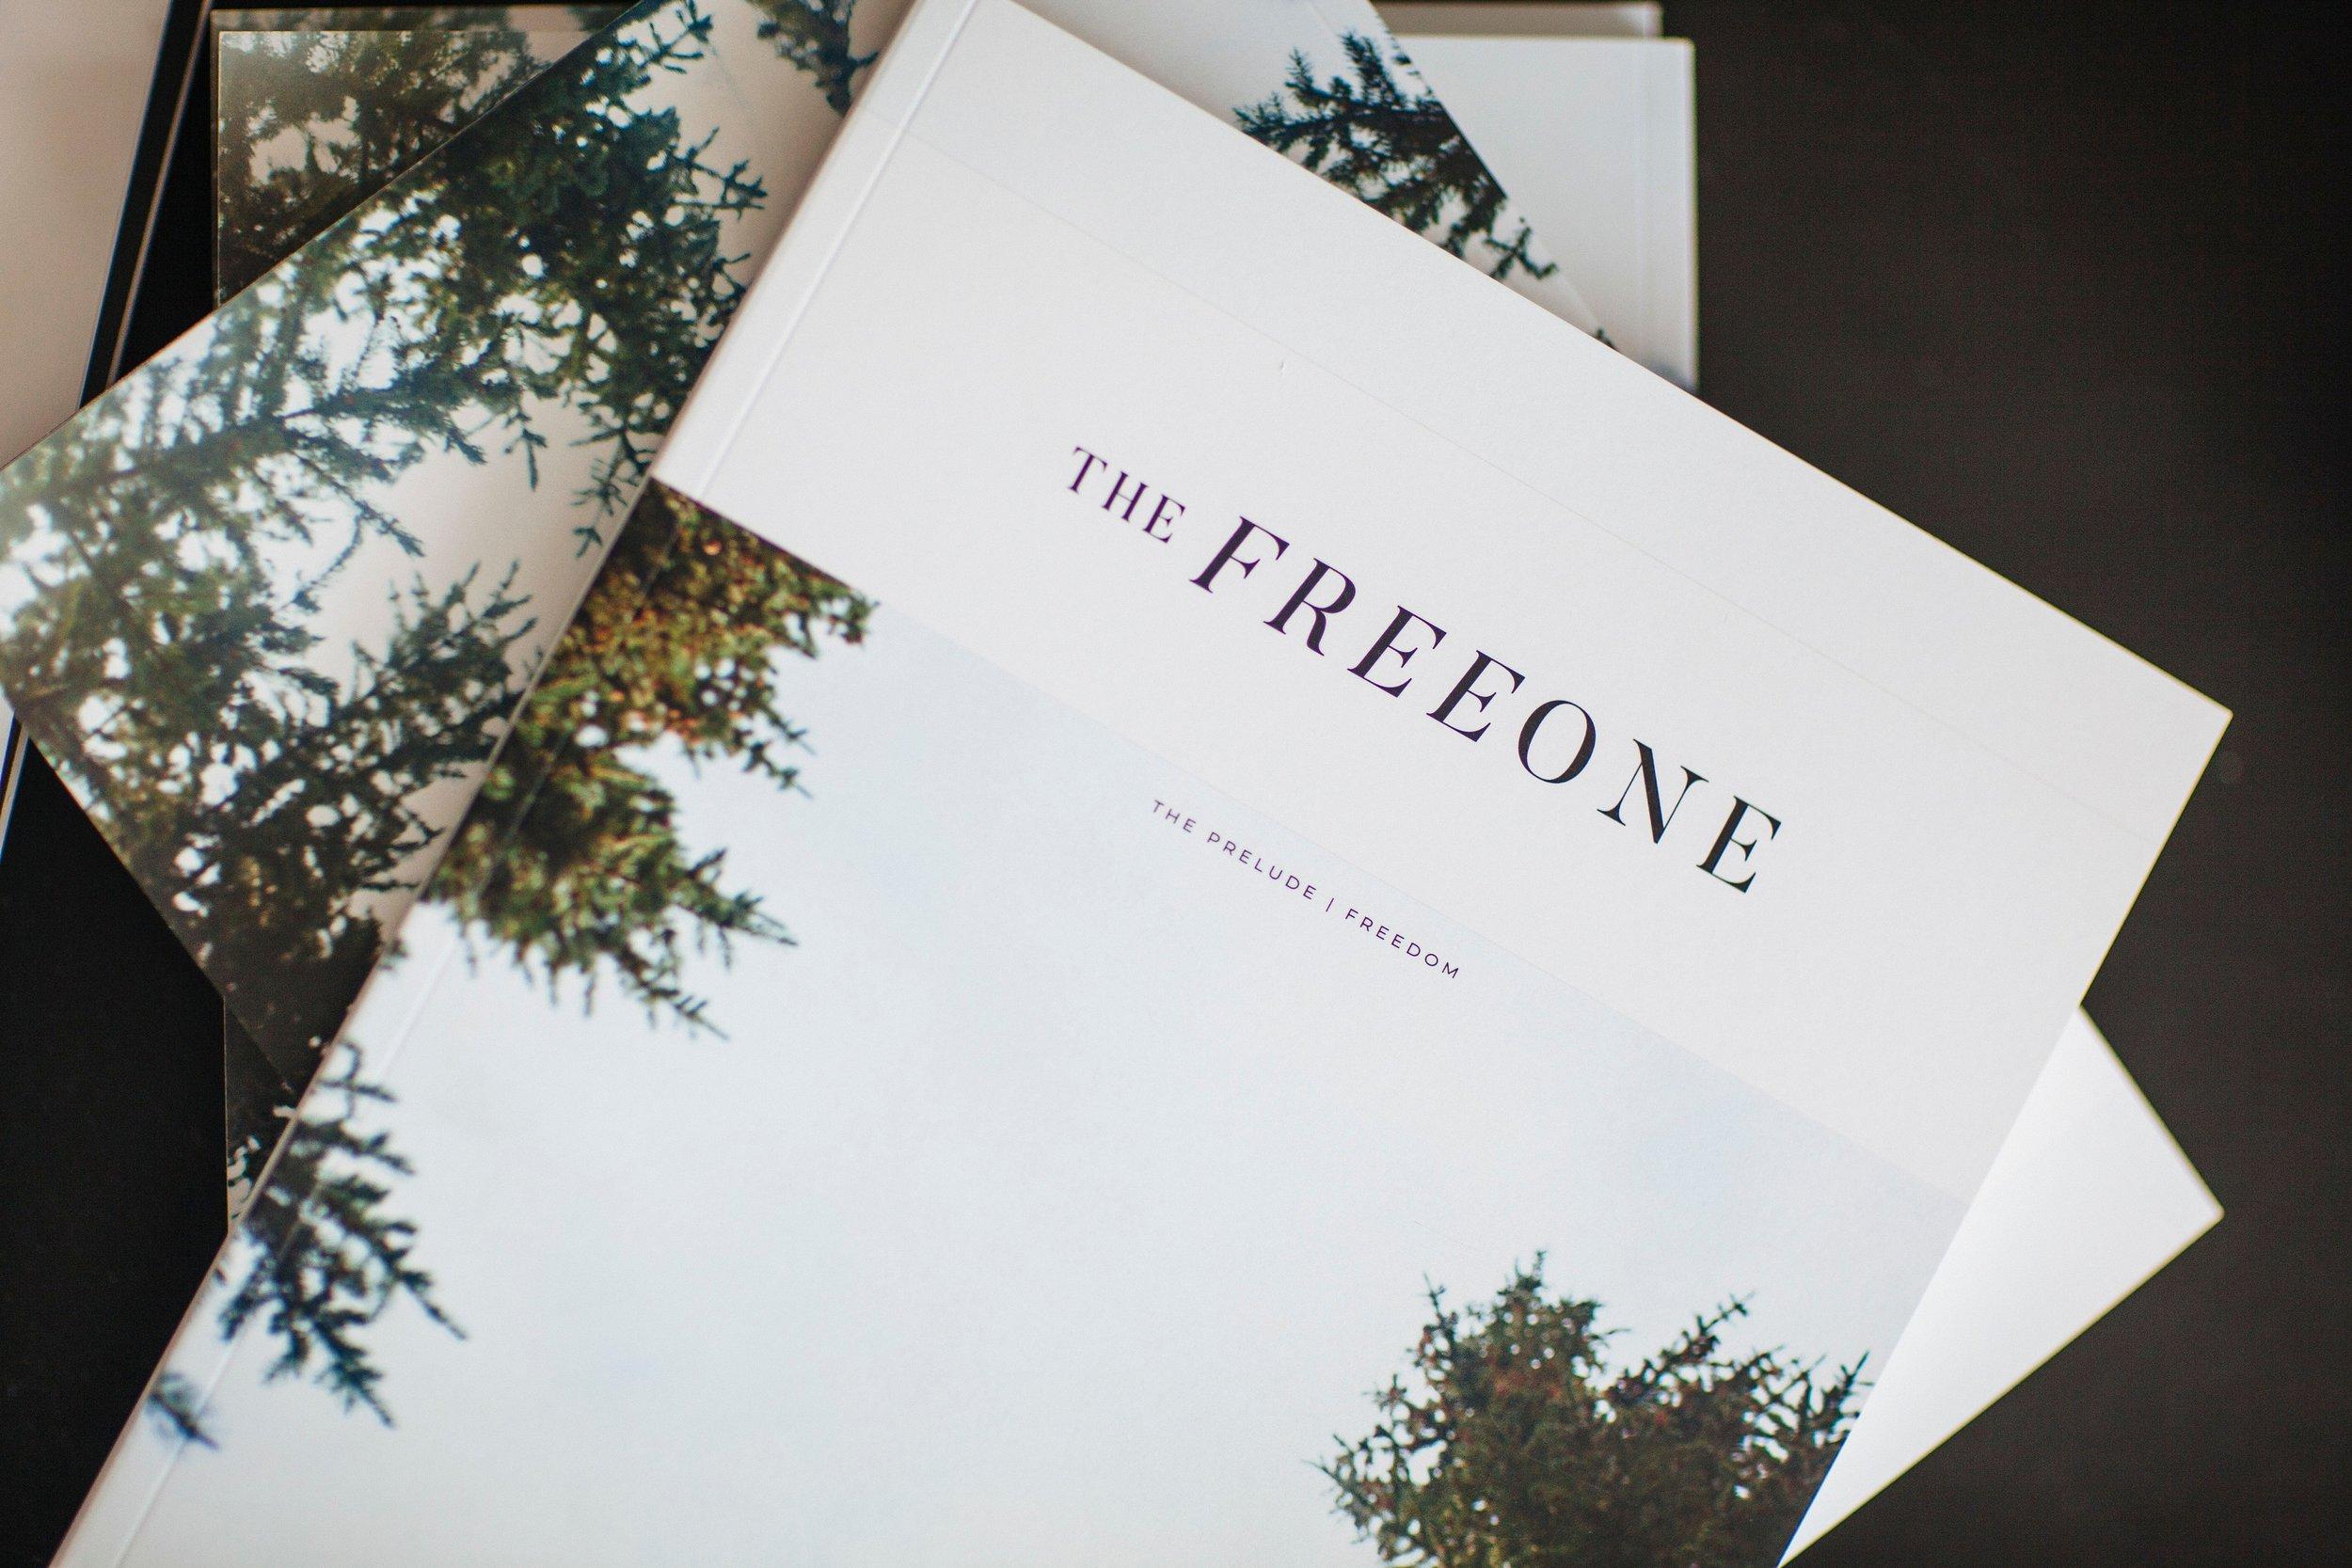 IMG_0830The Free One Prelude.jpg